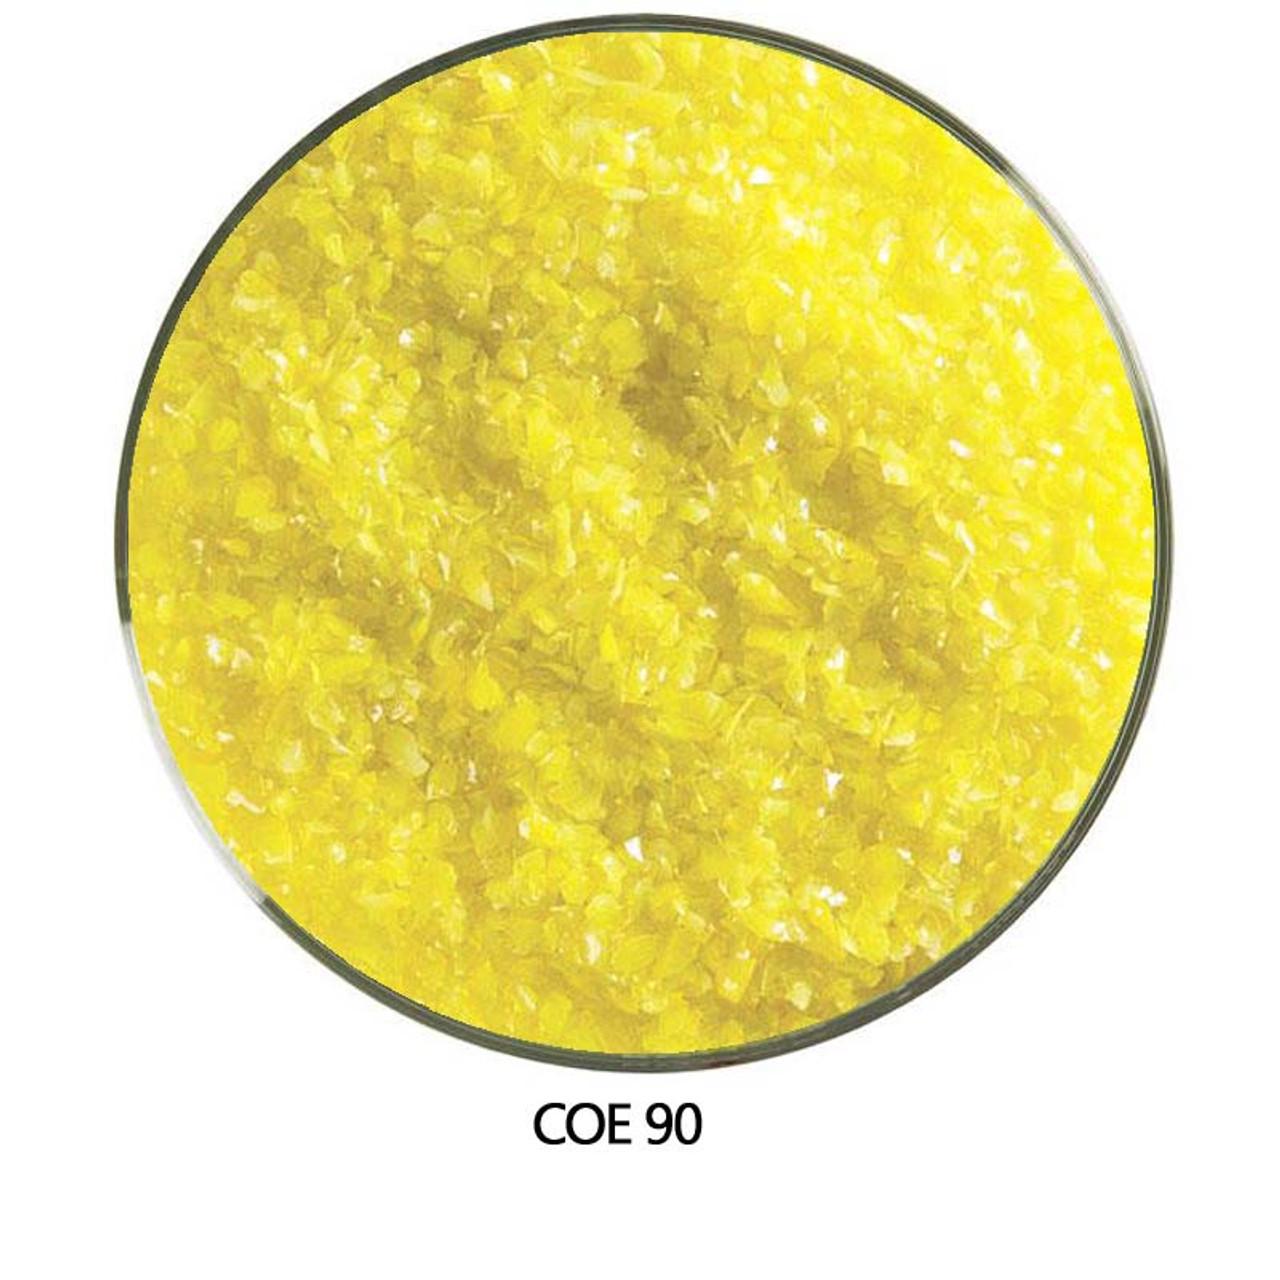 90 Coe Red Opal Medium Frit